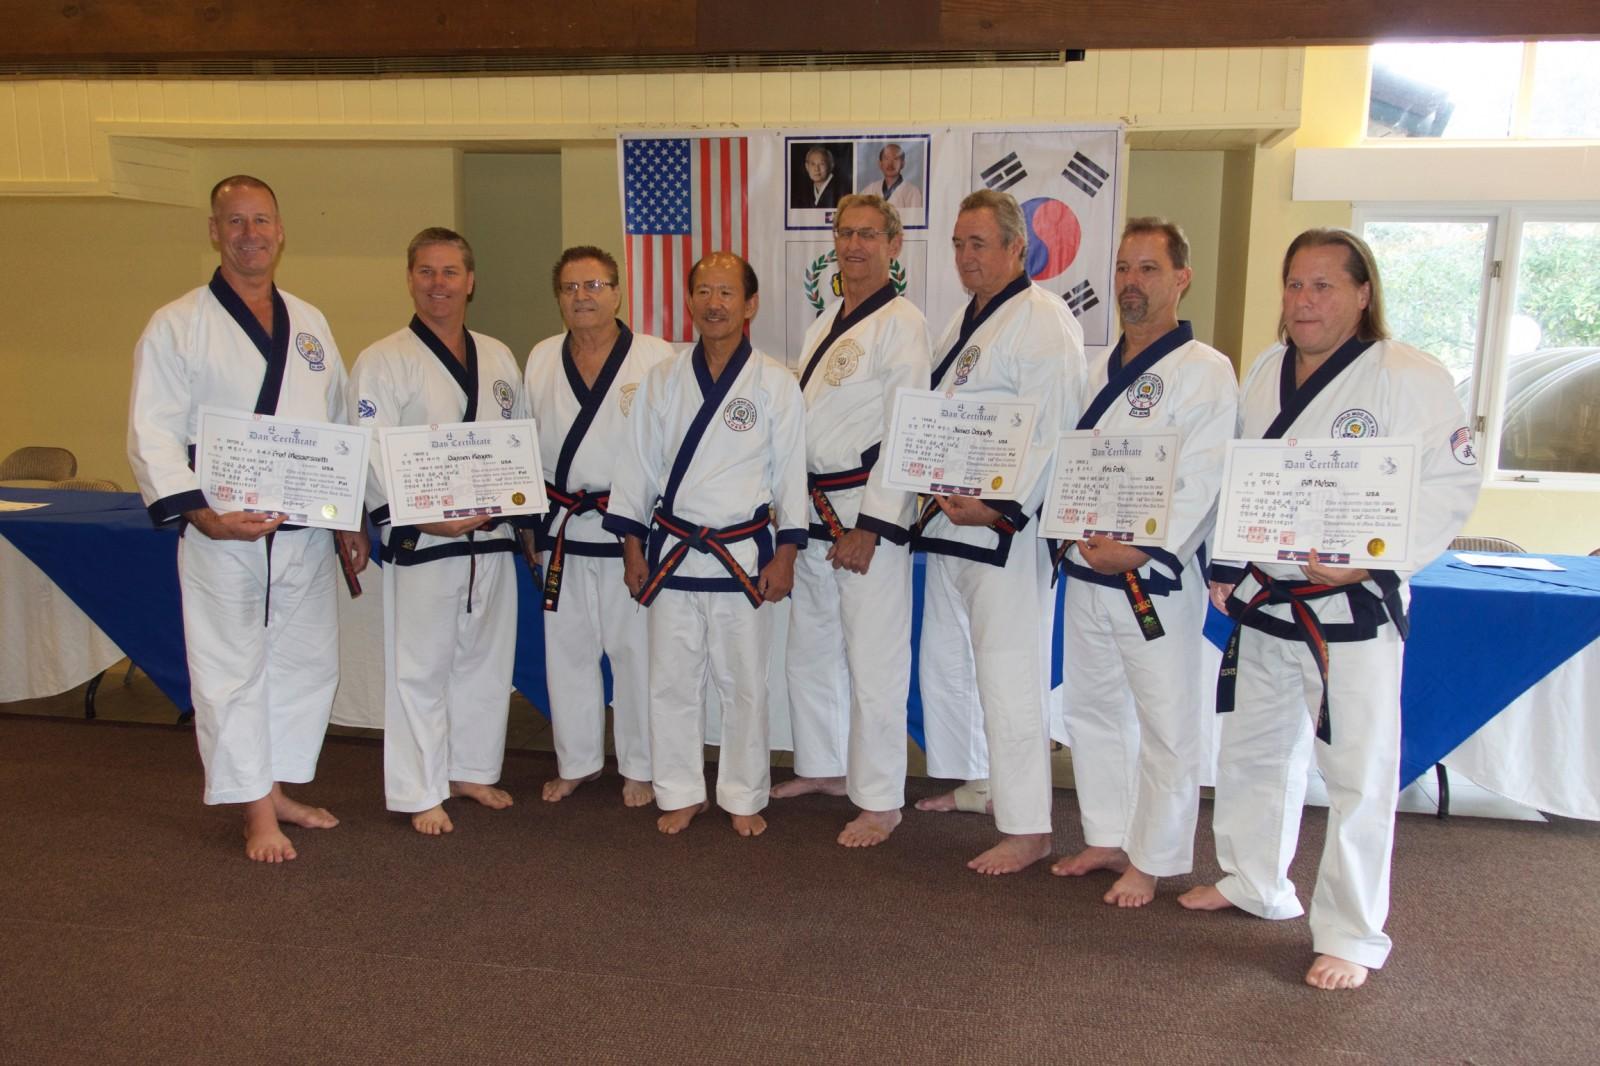 Five Moo Duk Kwan 8th Dan Rank Certifications Awarded